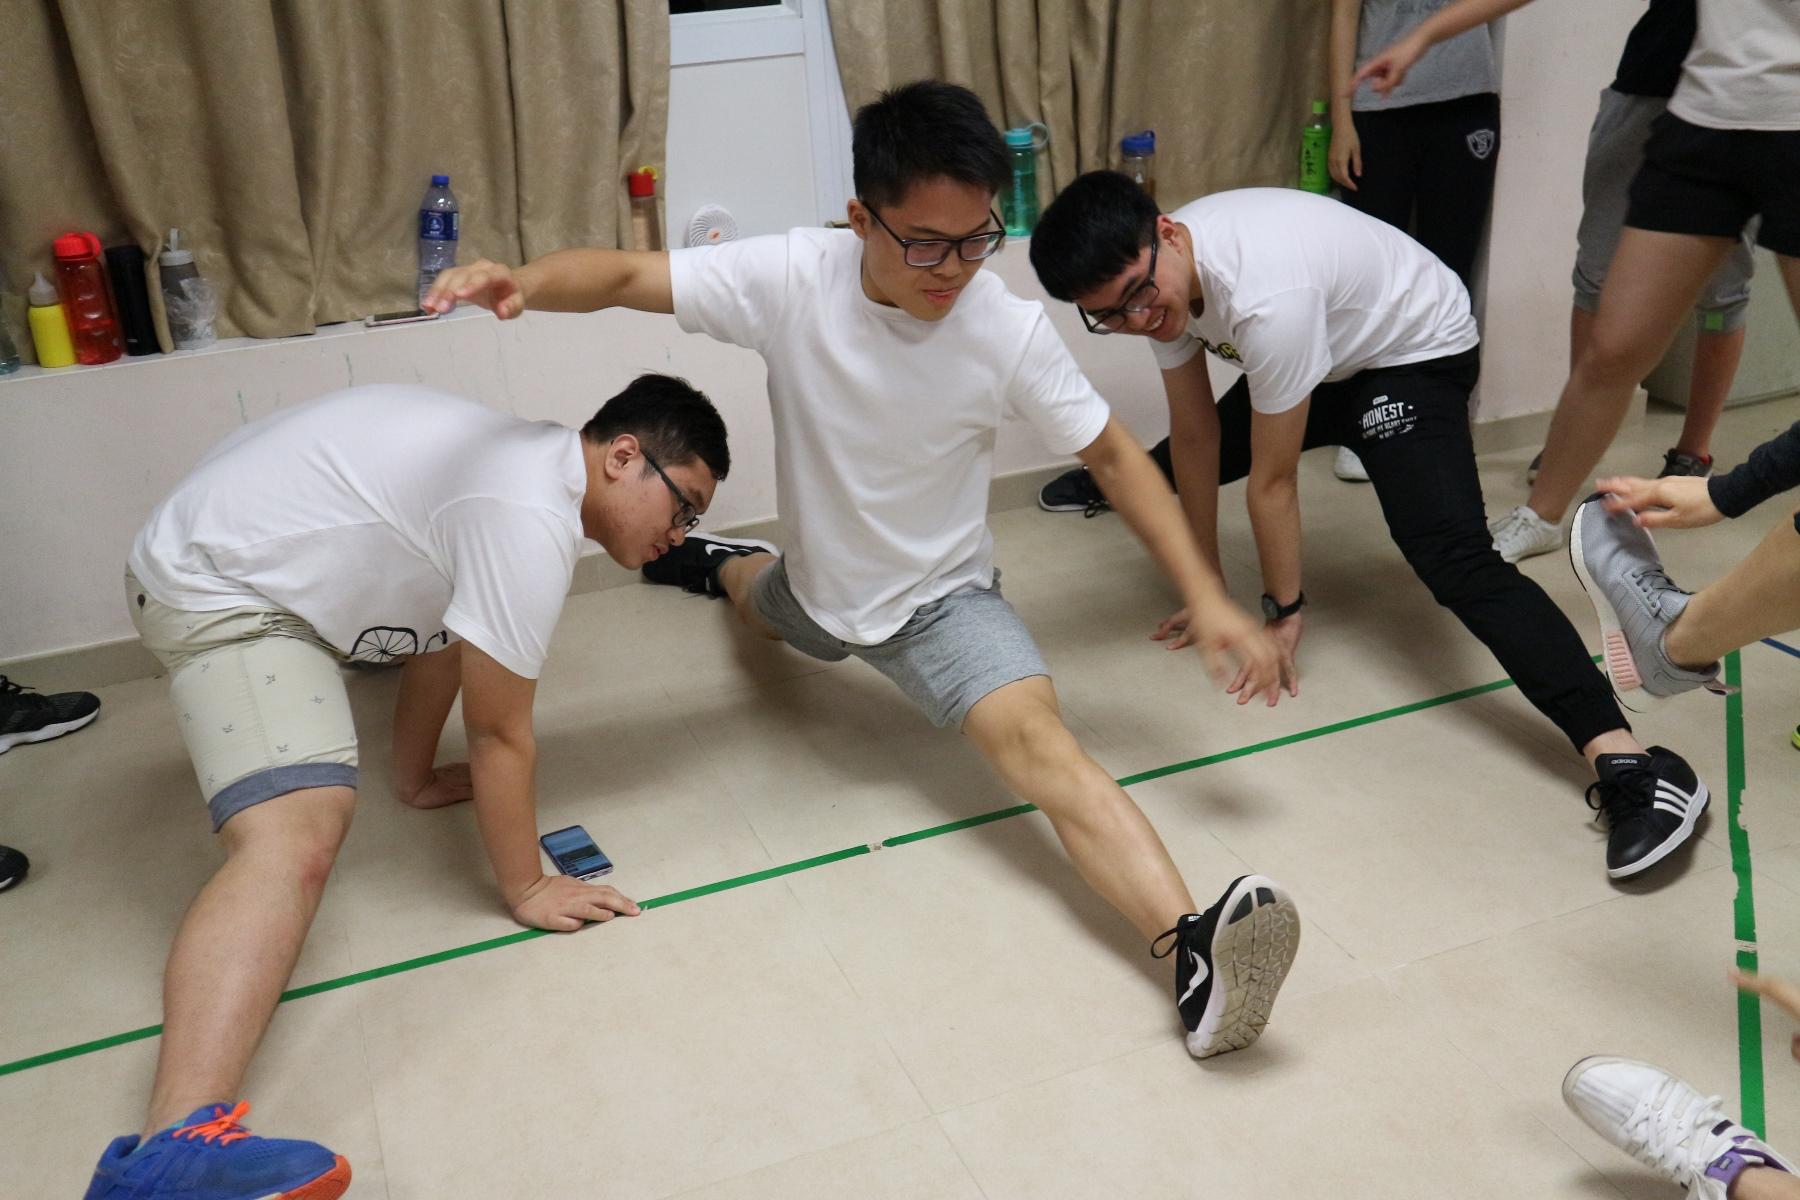 http://www.npc.edu.hk/sites/default/files/img_3296.jpg